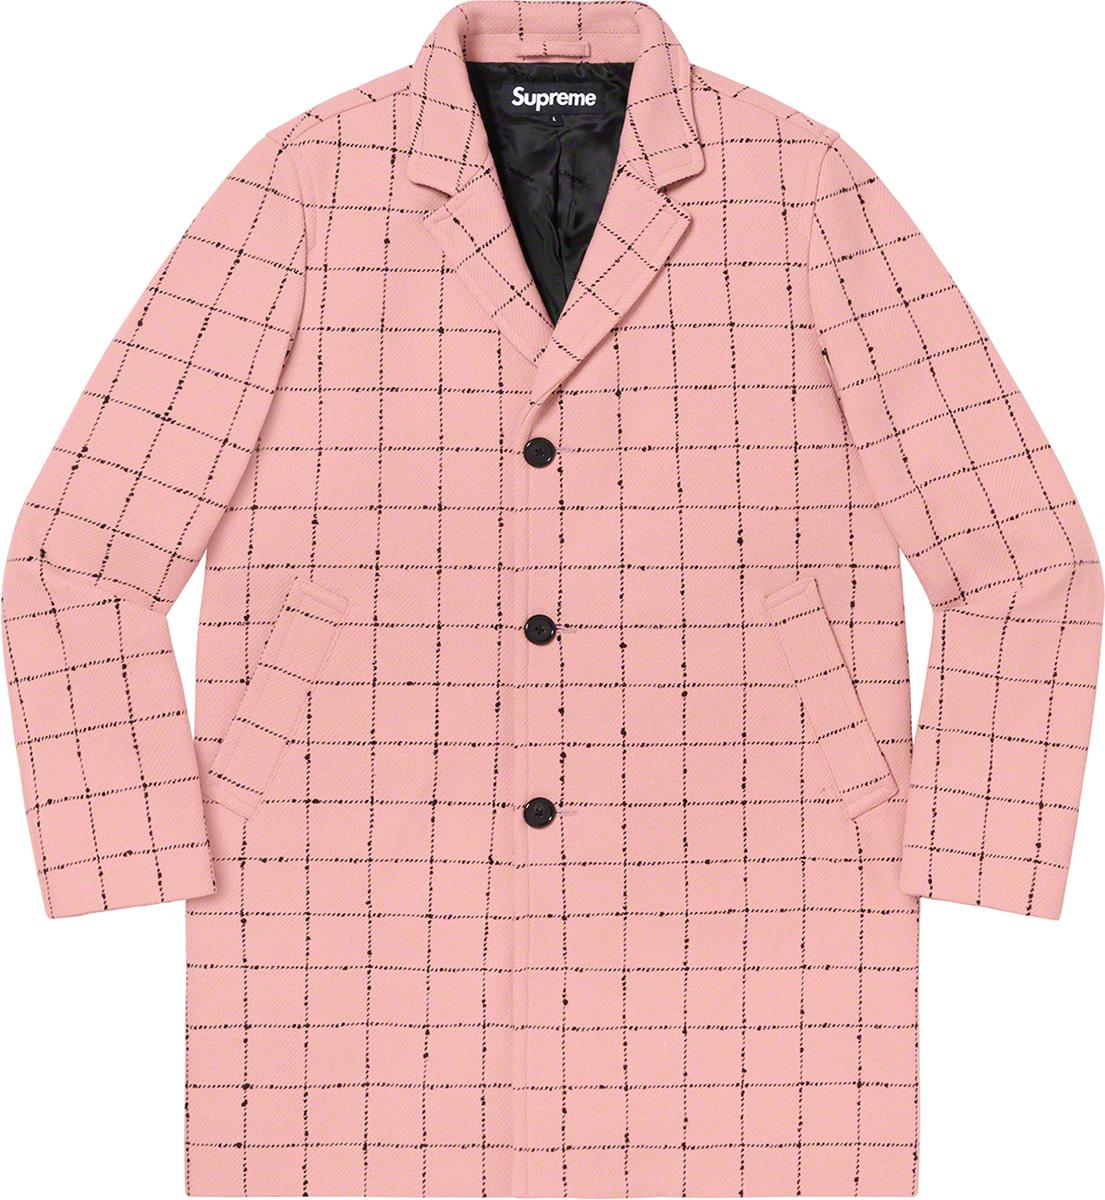 Wool Windowpane Overcoat - She's pink. She's got a chic pattern. She's ready to be worn all season long.